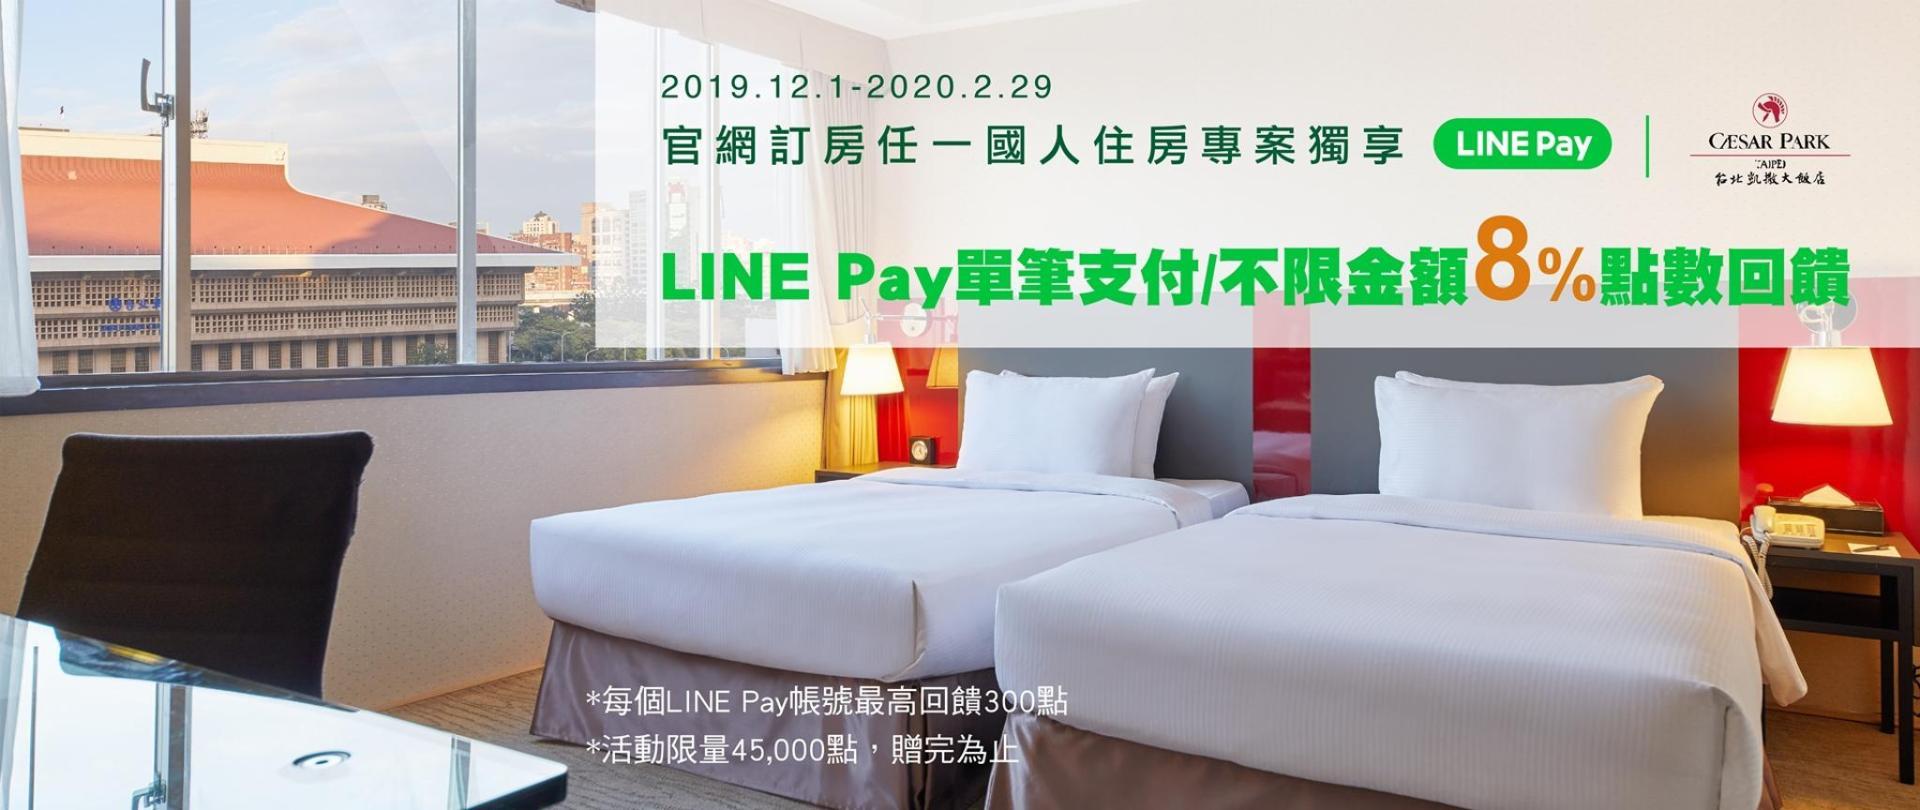 Slide Show1920X810_ 2019Line Pay-01.jpg